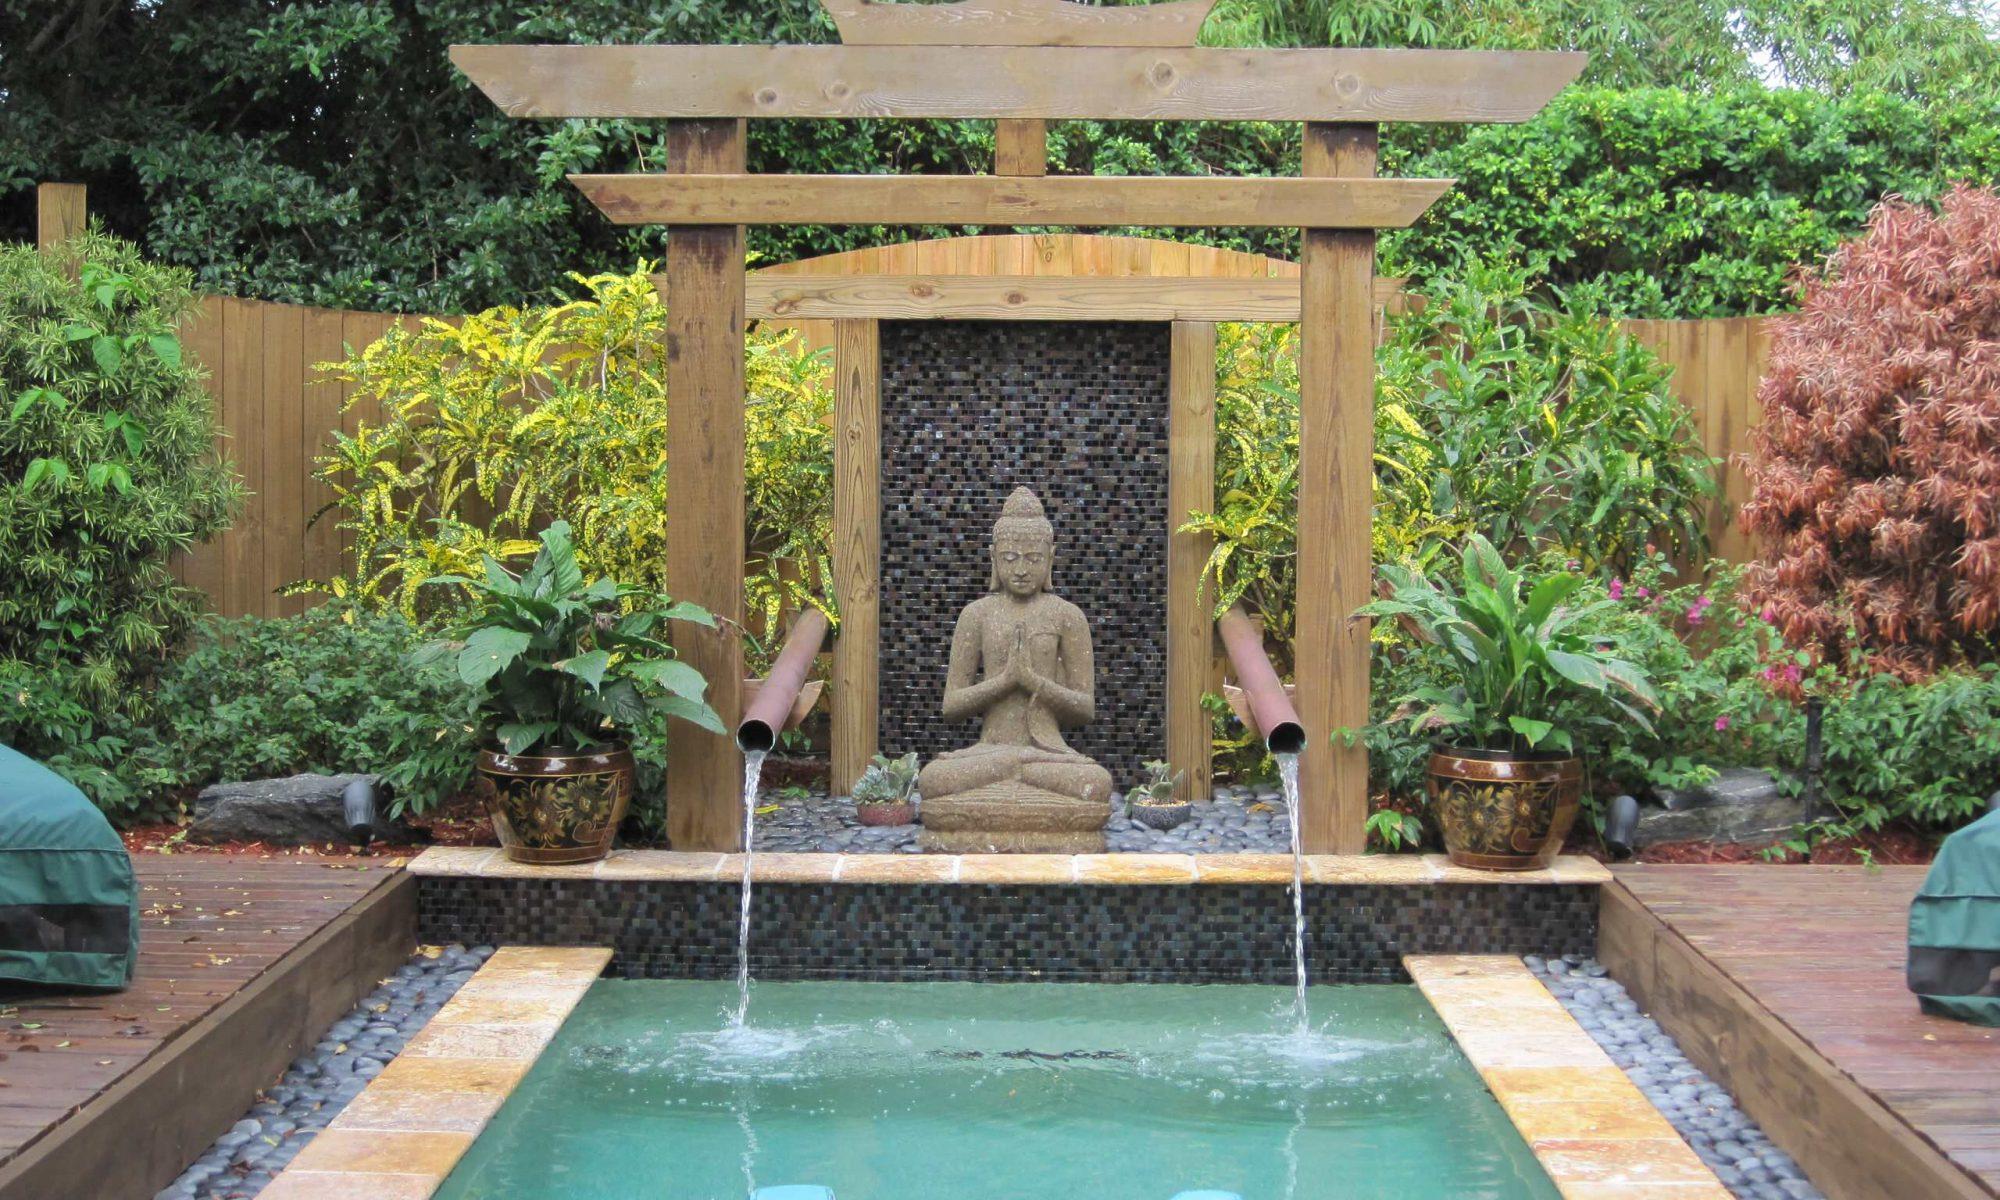 Budista en piscina estilo zen